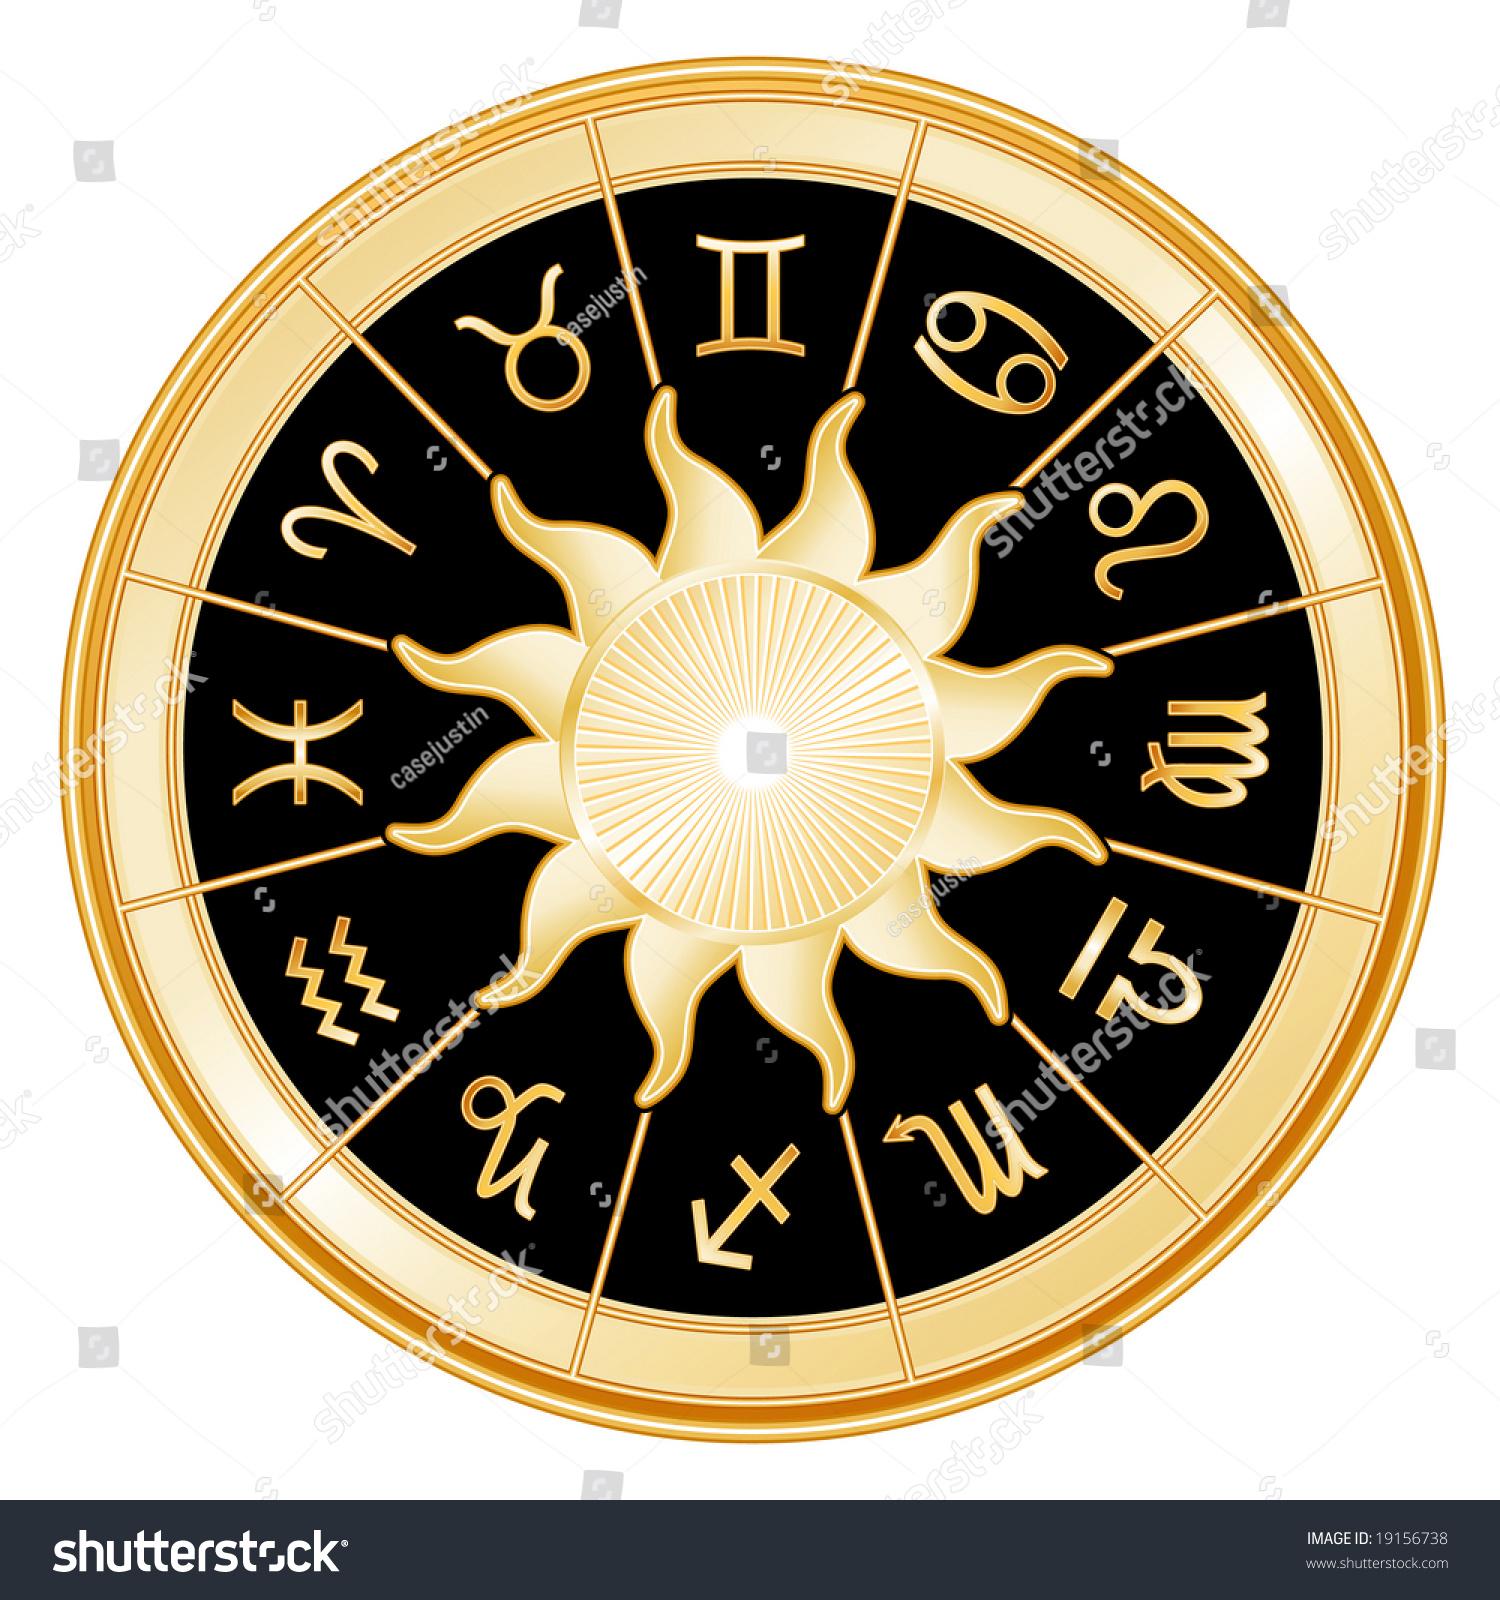 horoscope signs zodiac 12 astrology symbols stock illustration 19156738 shutterstock. Black Bedroom Furniture Sets. Home Design Ideas